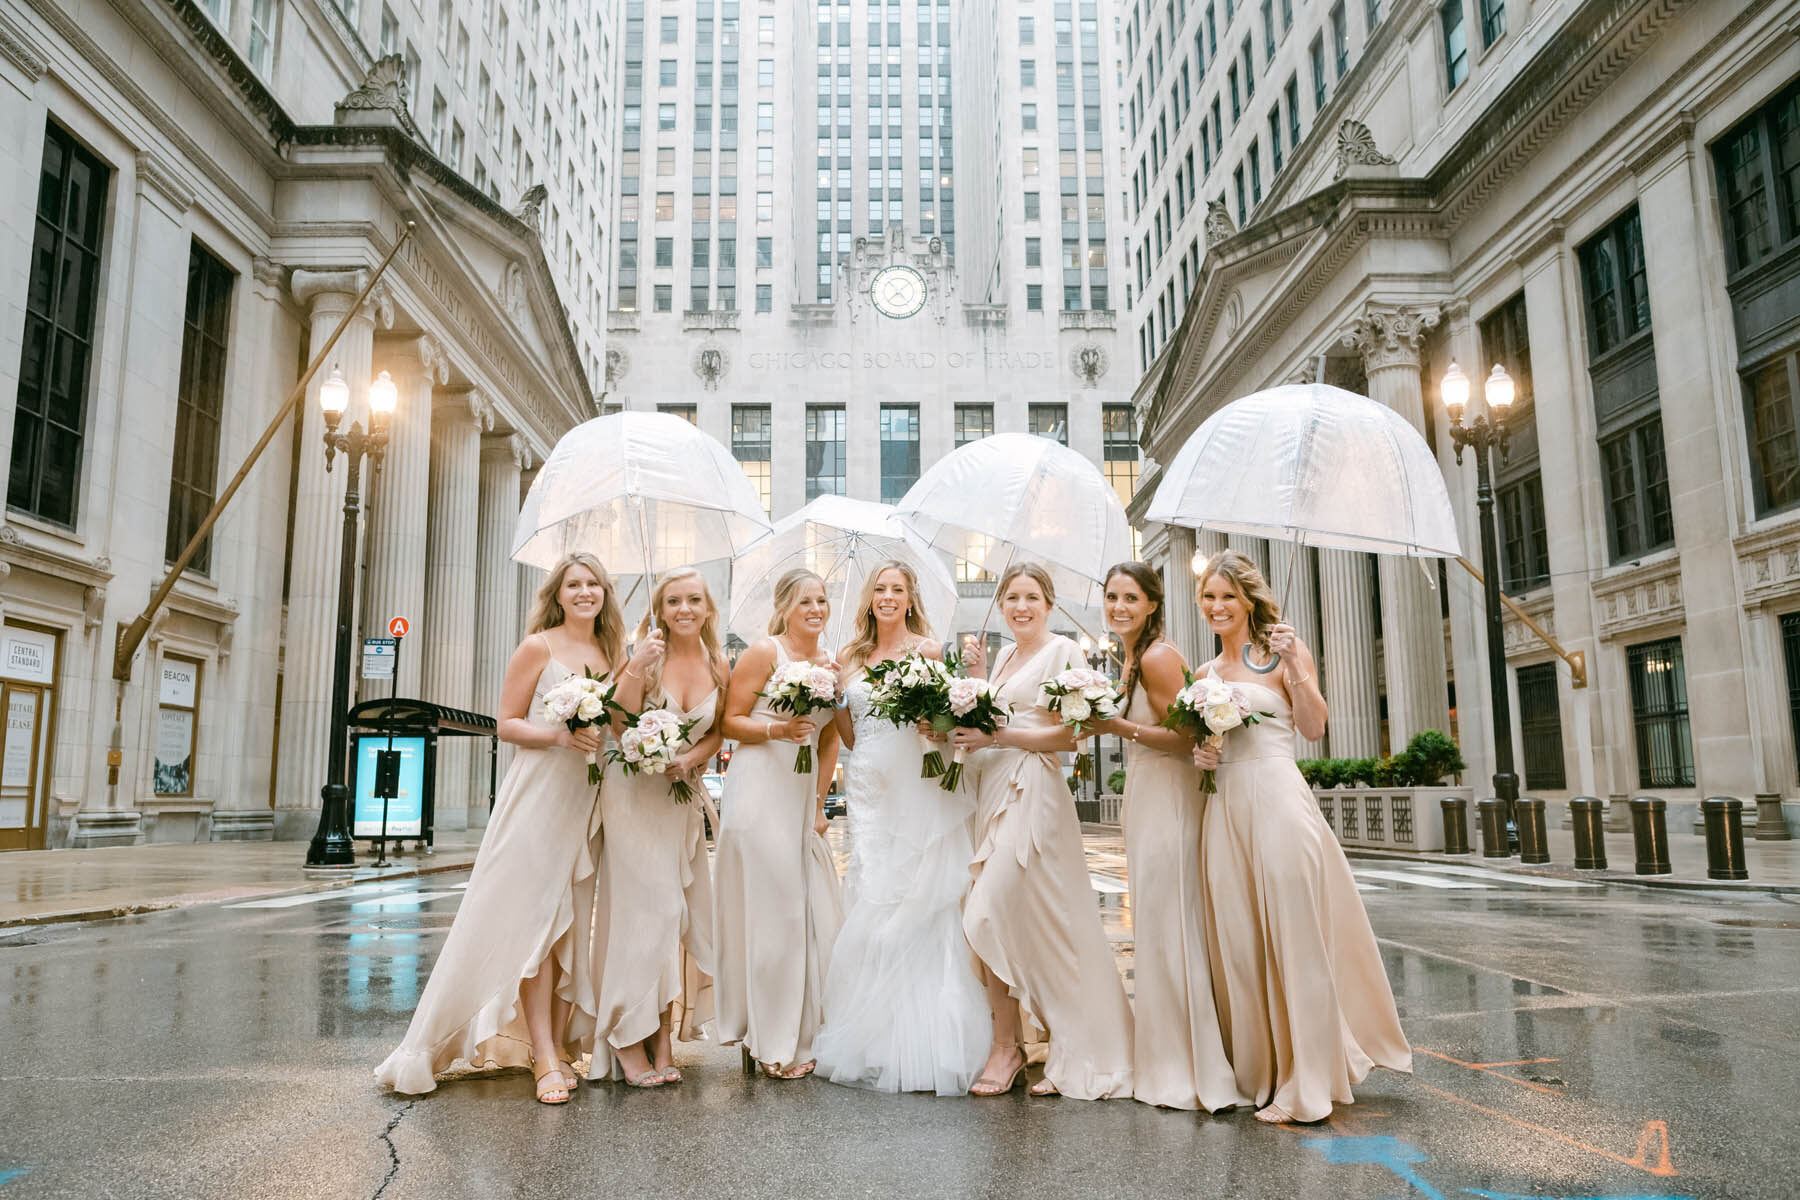 Bridesmaids Chicago Board of Trade